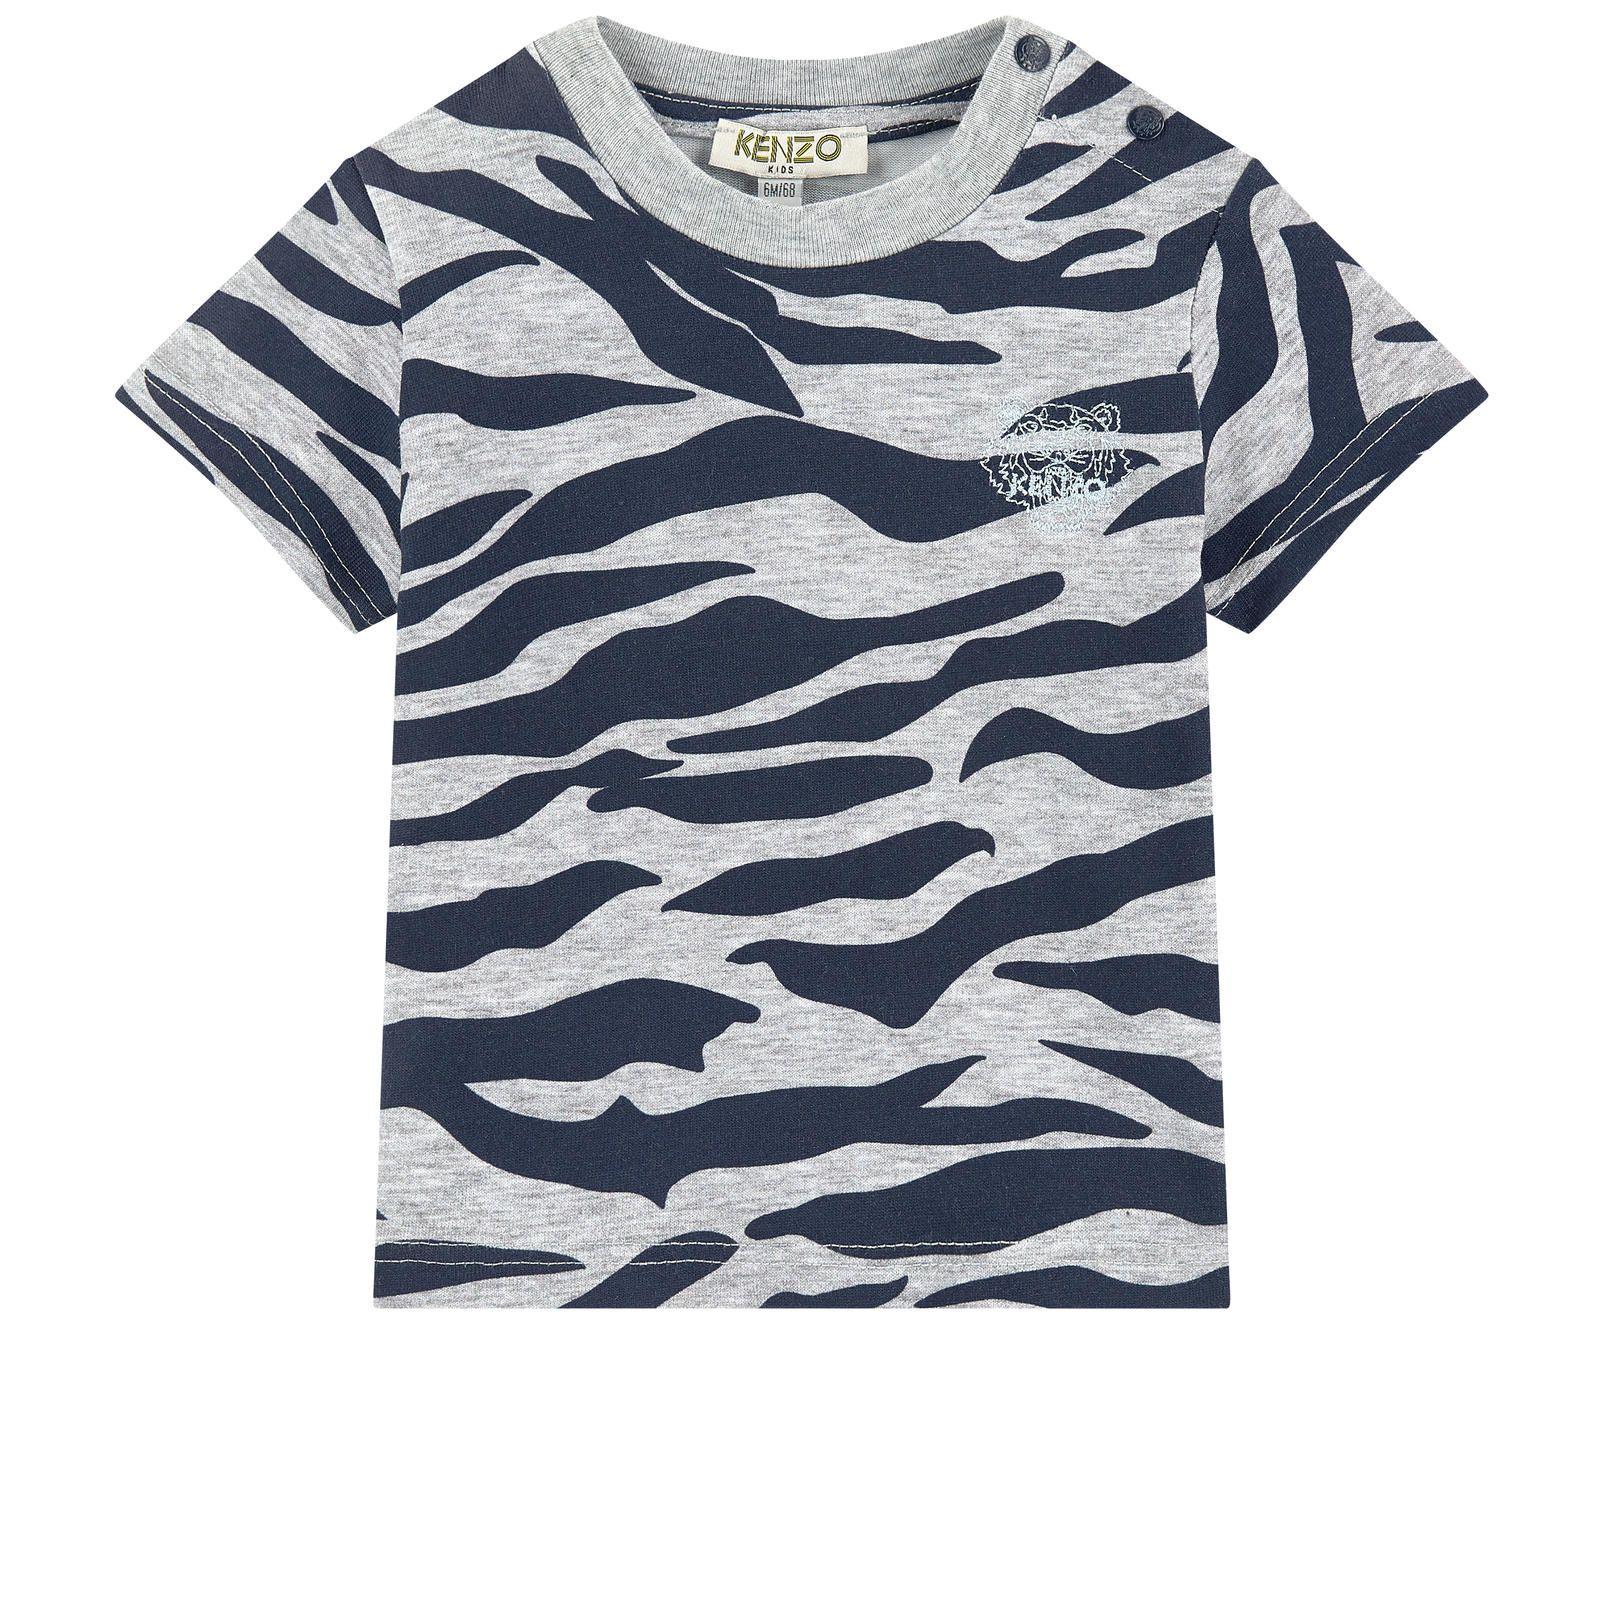 77d1c81a3 Kenzo Kids - T-shirt with a print - Tiger Stripes | Boys Clothes ...